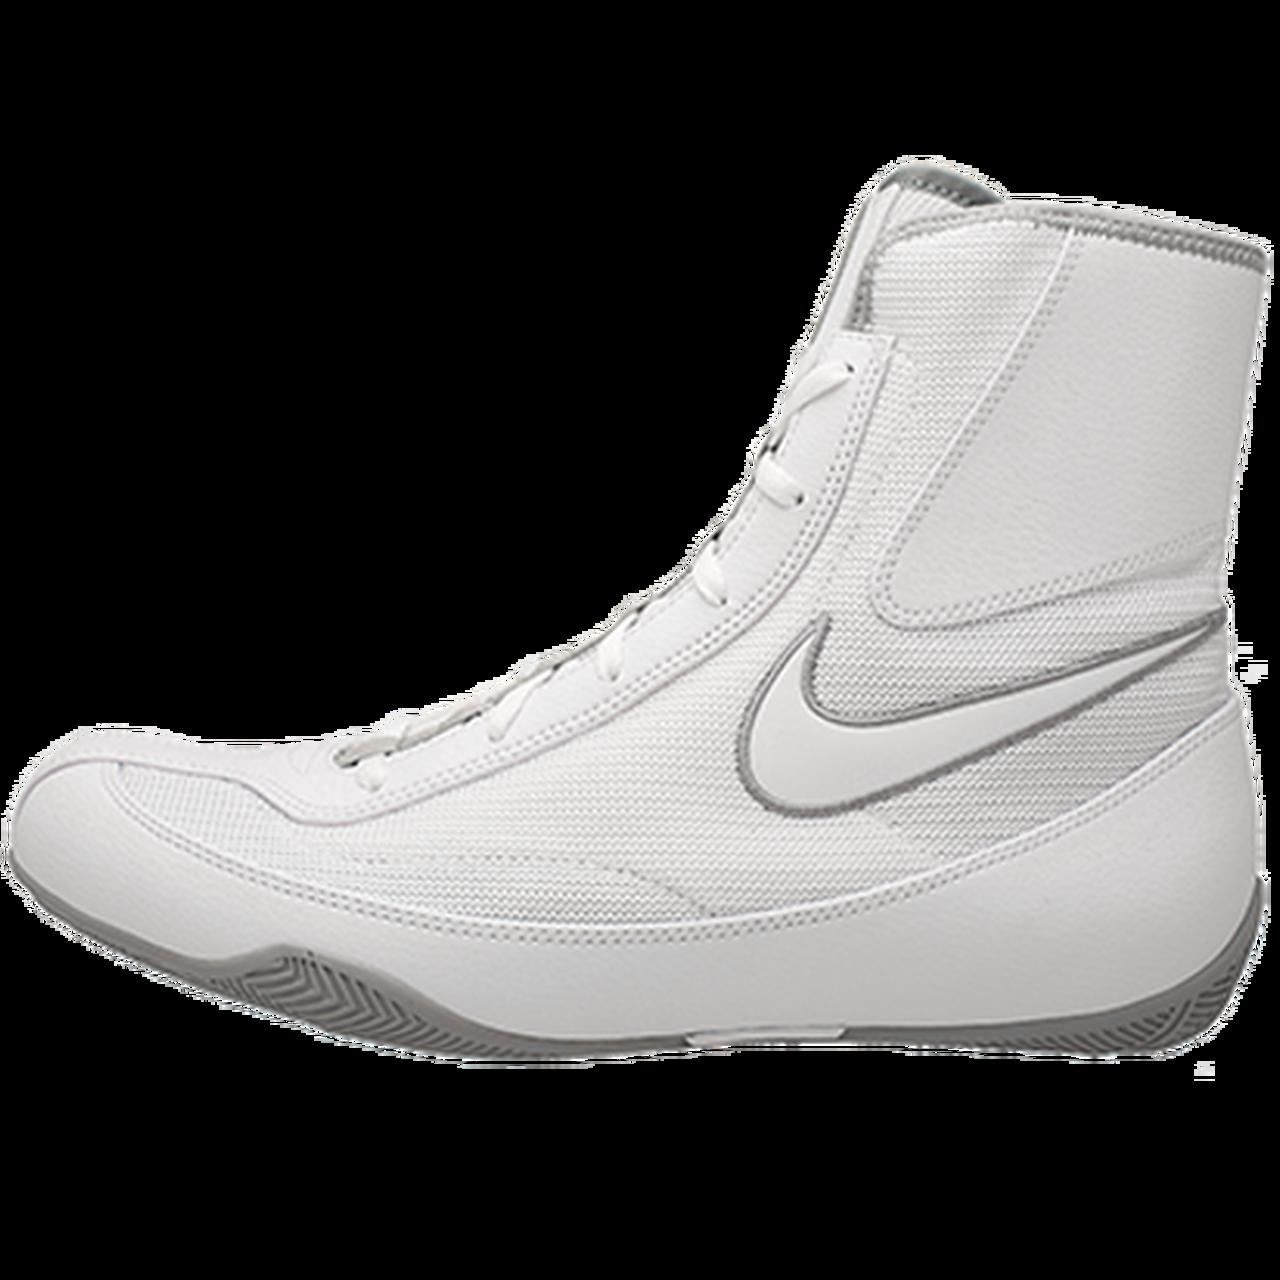 monstruo póngase en fila Cierto  Nike Machomai 2.0 White Boxing Shoes - PRO FIGHT SHOP